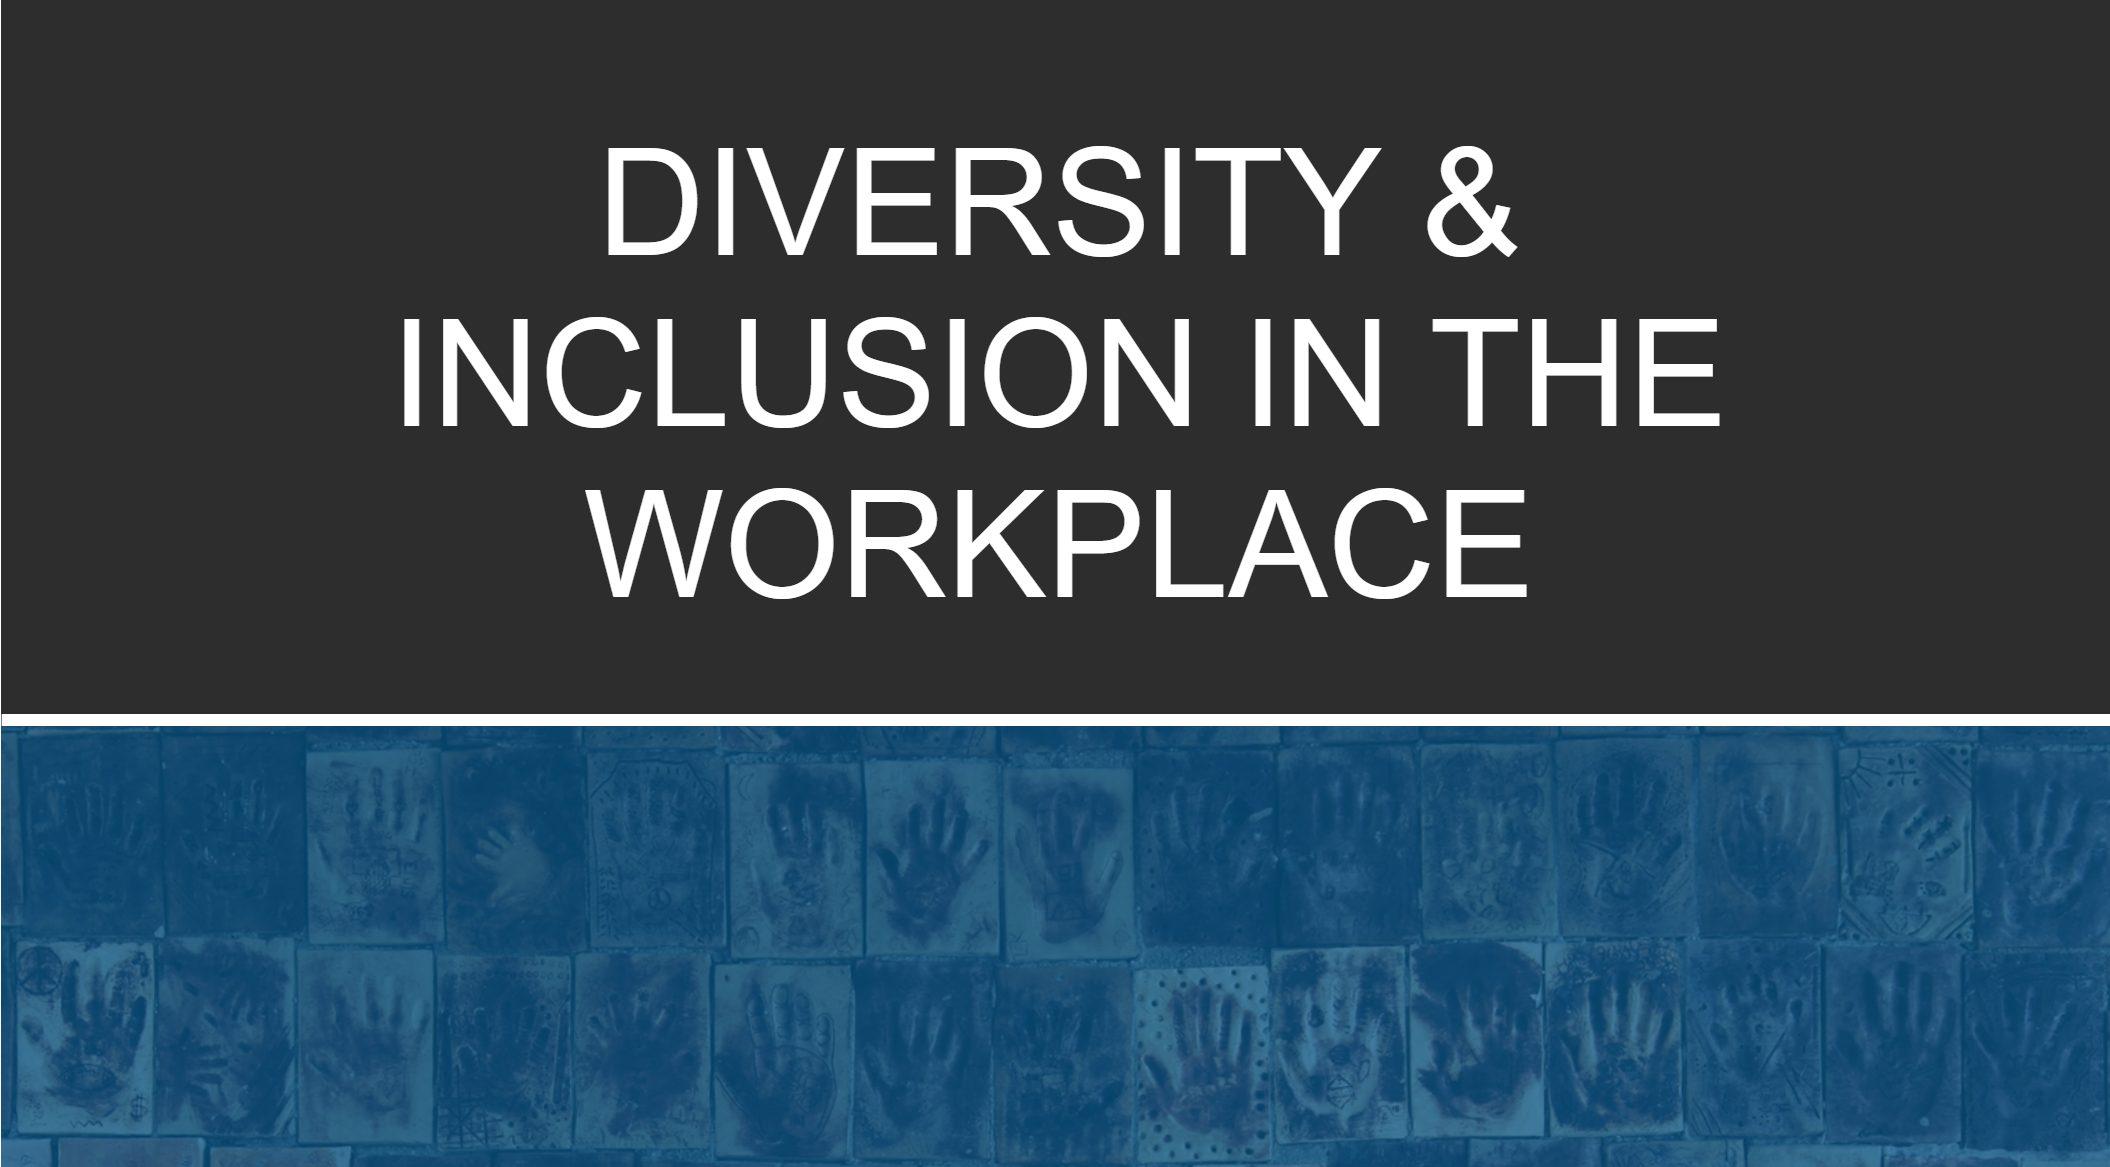 diversityintheworkplace